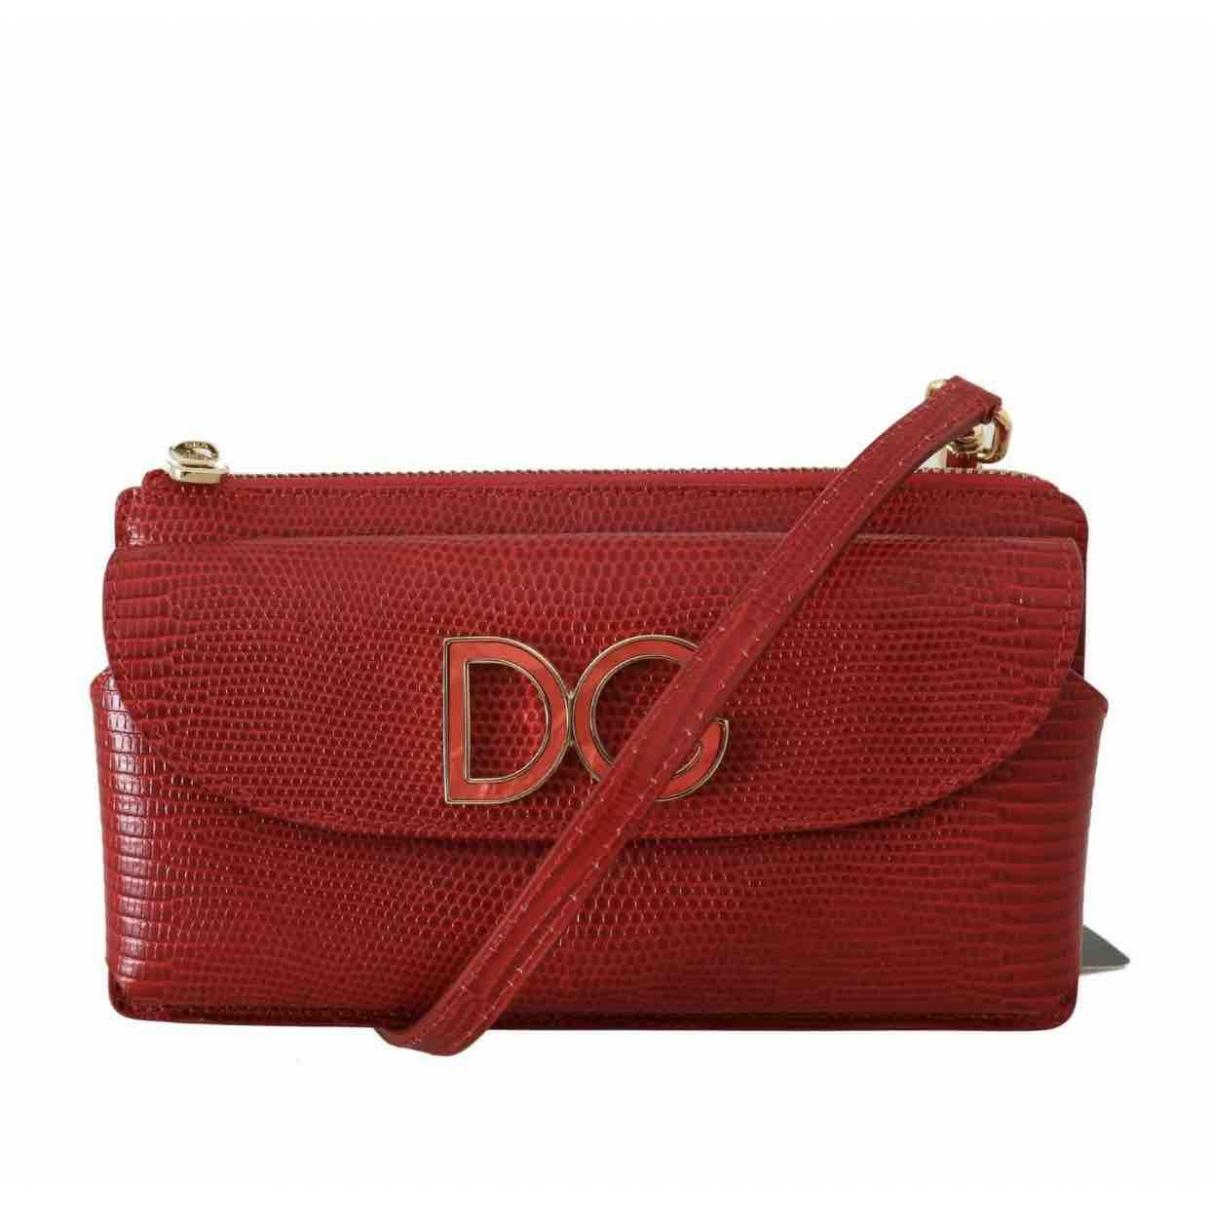 Dolce & Gabbana - Sac a main Millenials pour femme en cuir - rouge